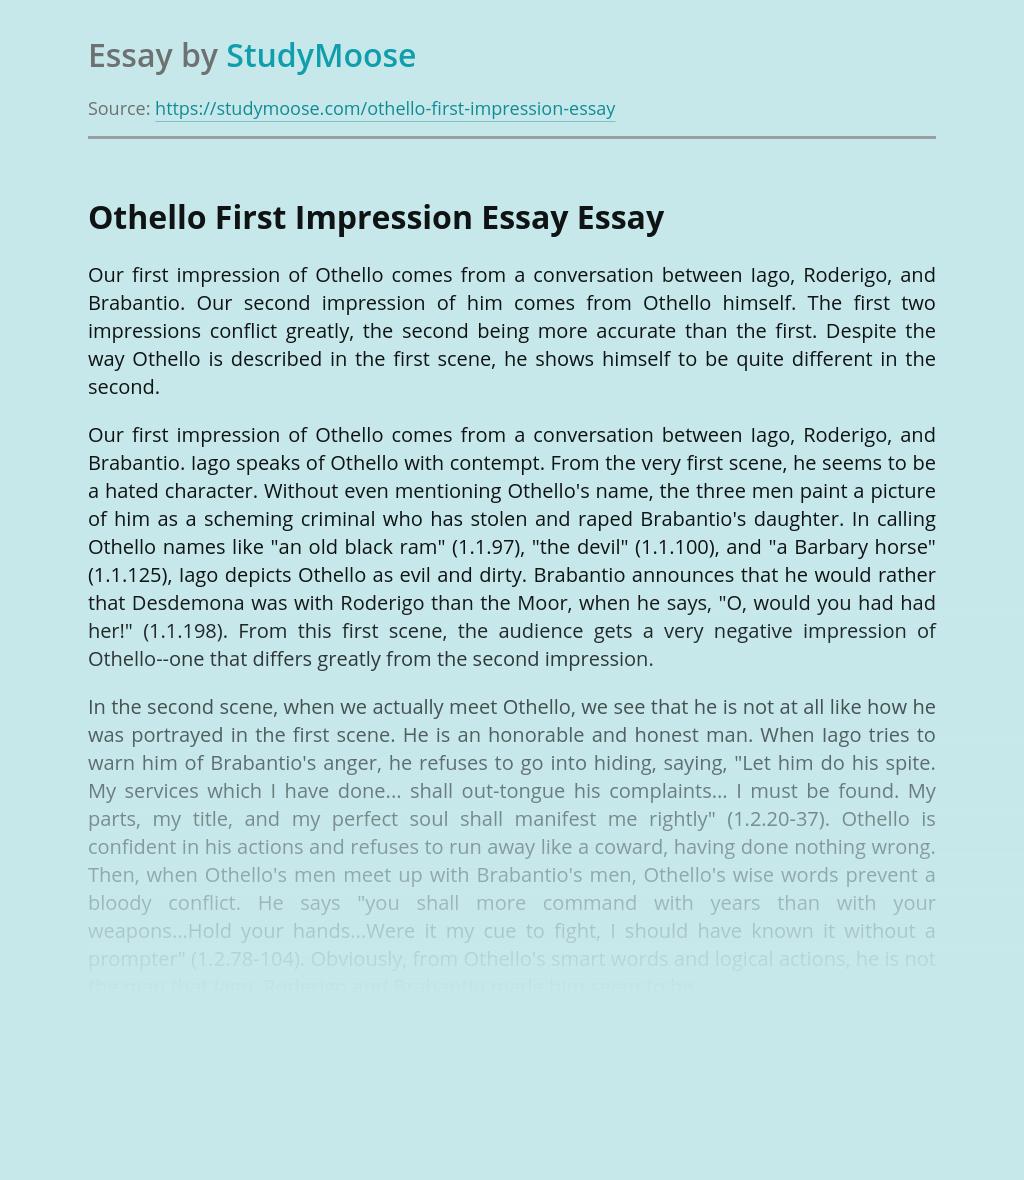 Othello First Impression Essay